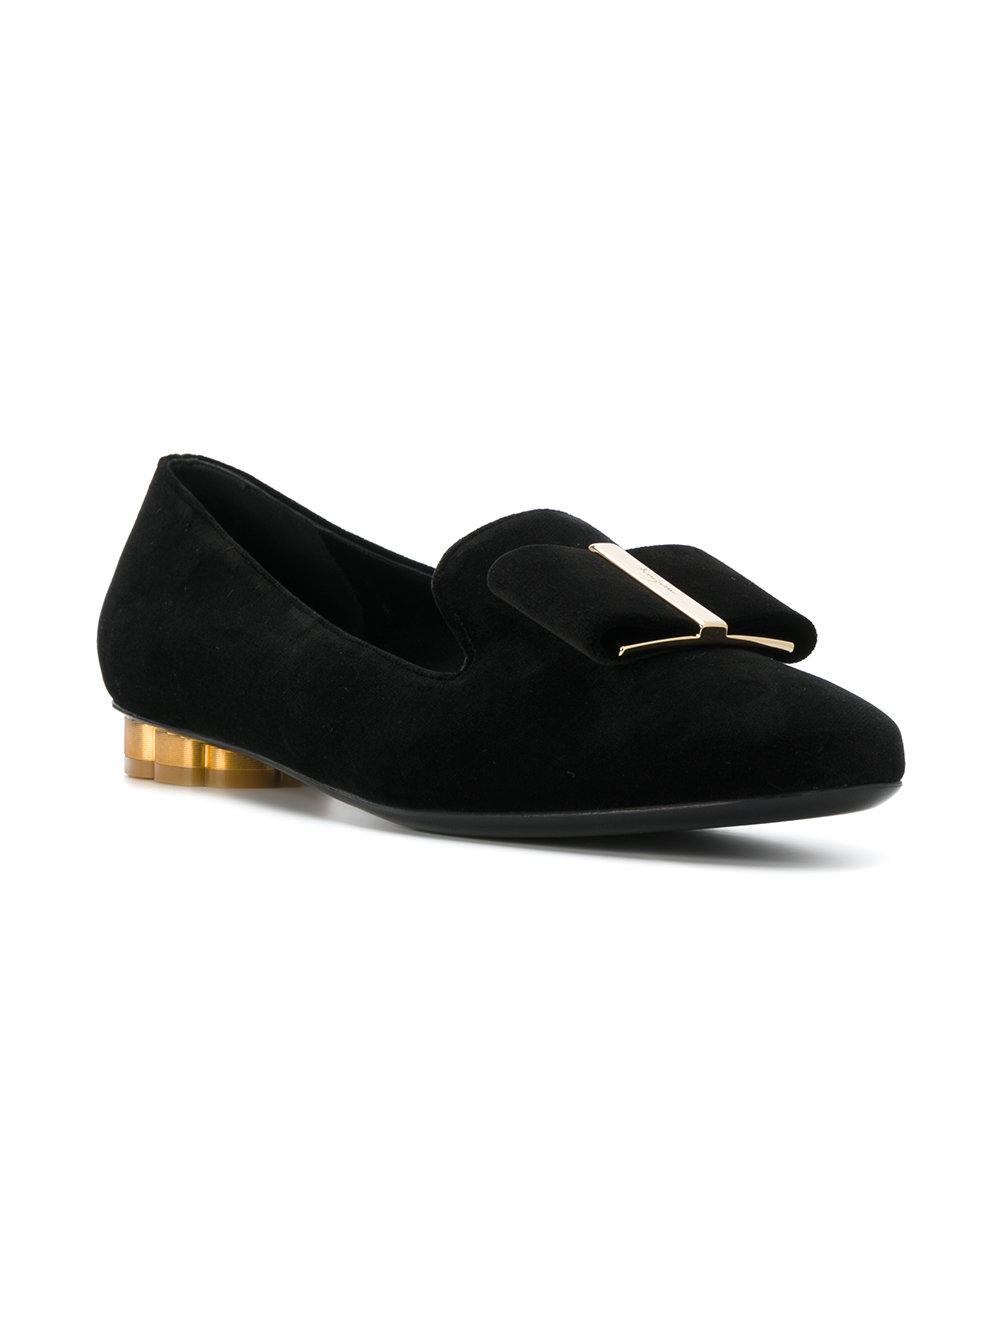 56ac33d0a8b5 Lyst - Ferragamo Flower Heel Smoking Shoes in Black - Save 14%